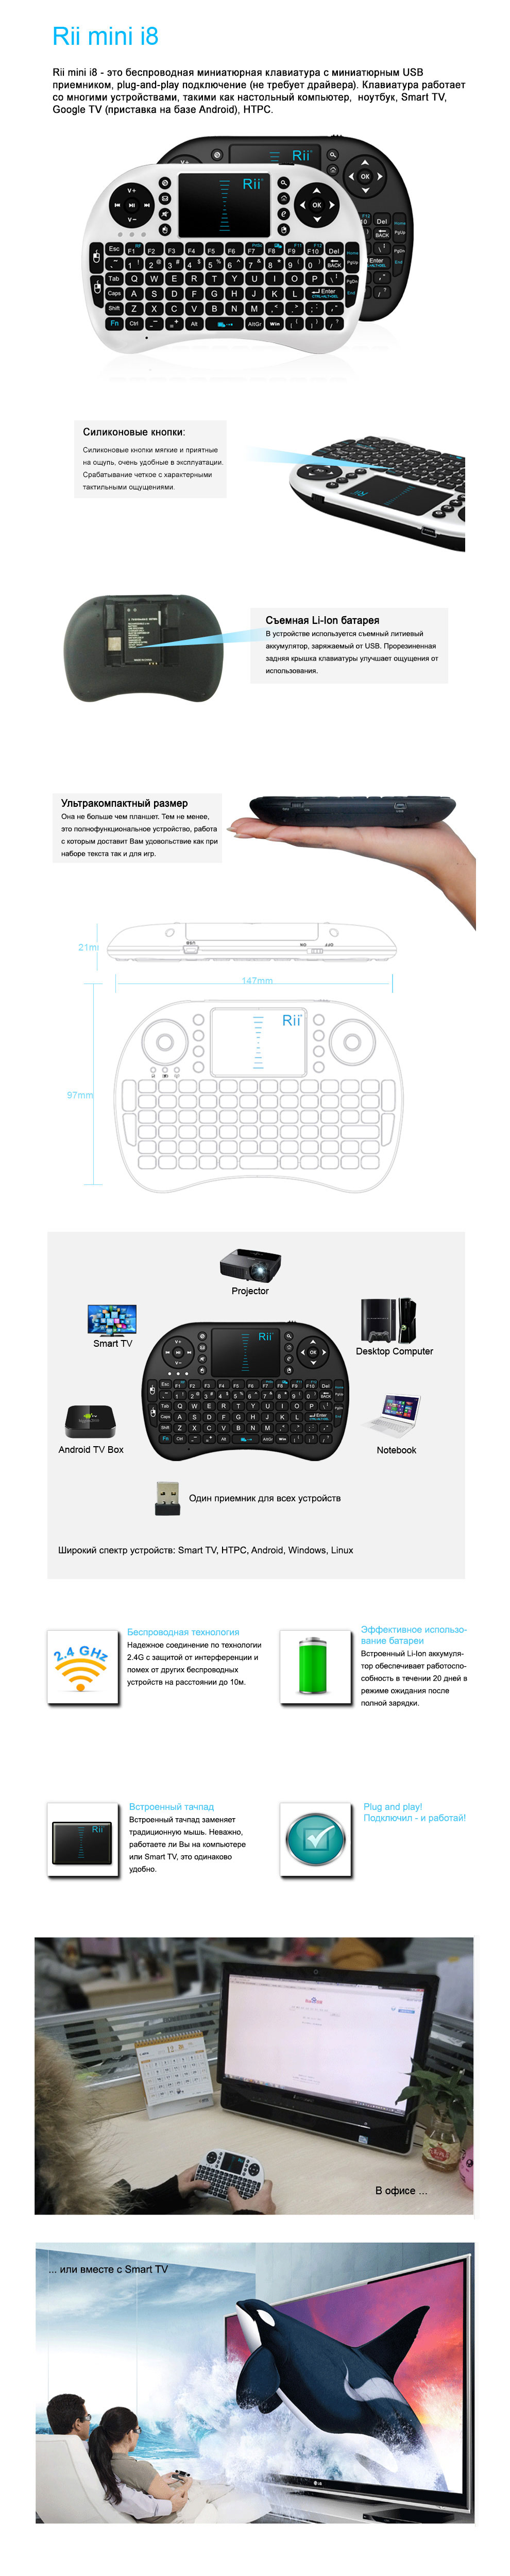 Rii mini i8 keyboard RT-MWK08, [2 4G] touchpad for Smart TV